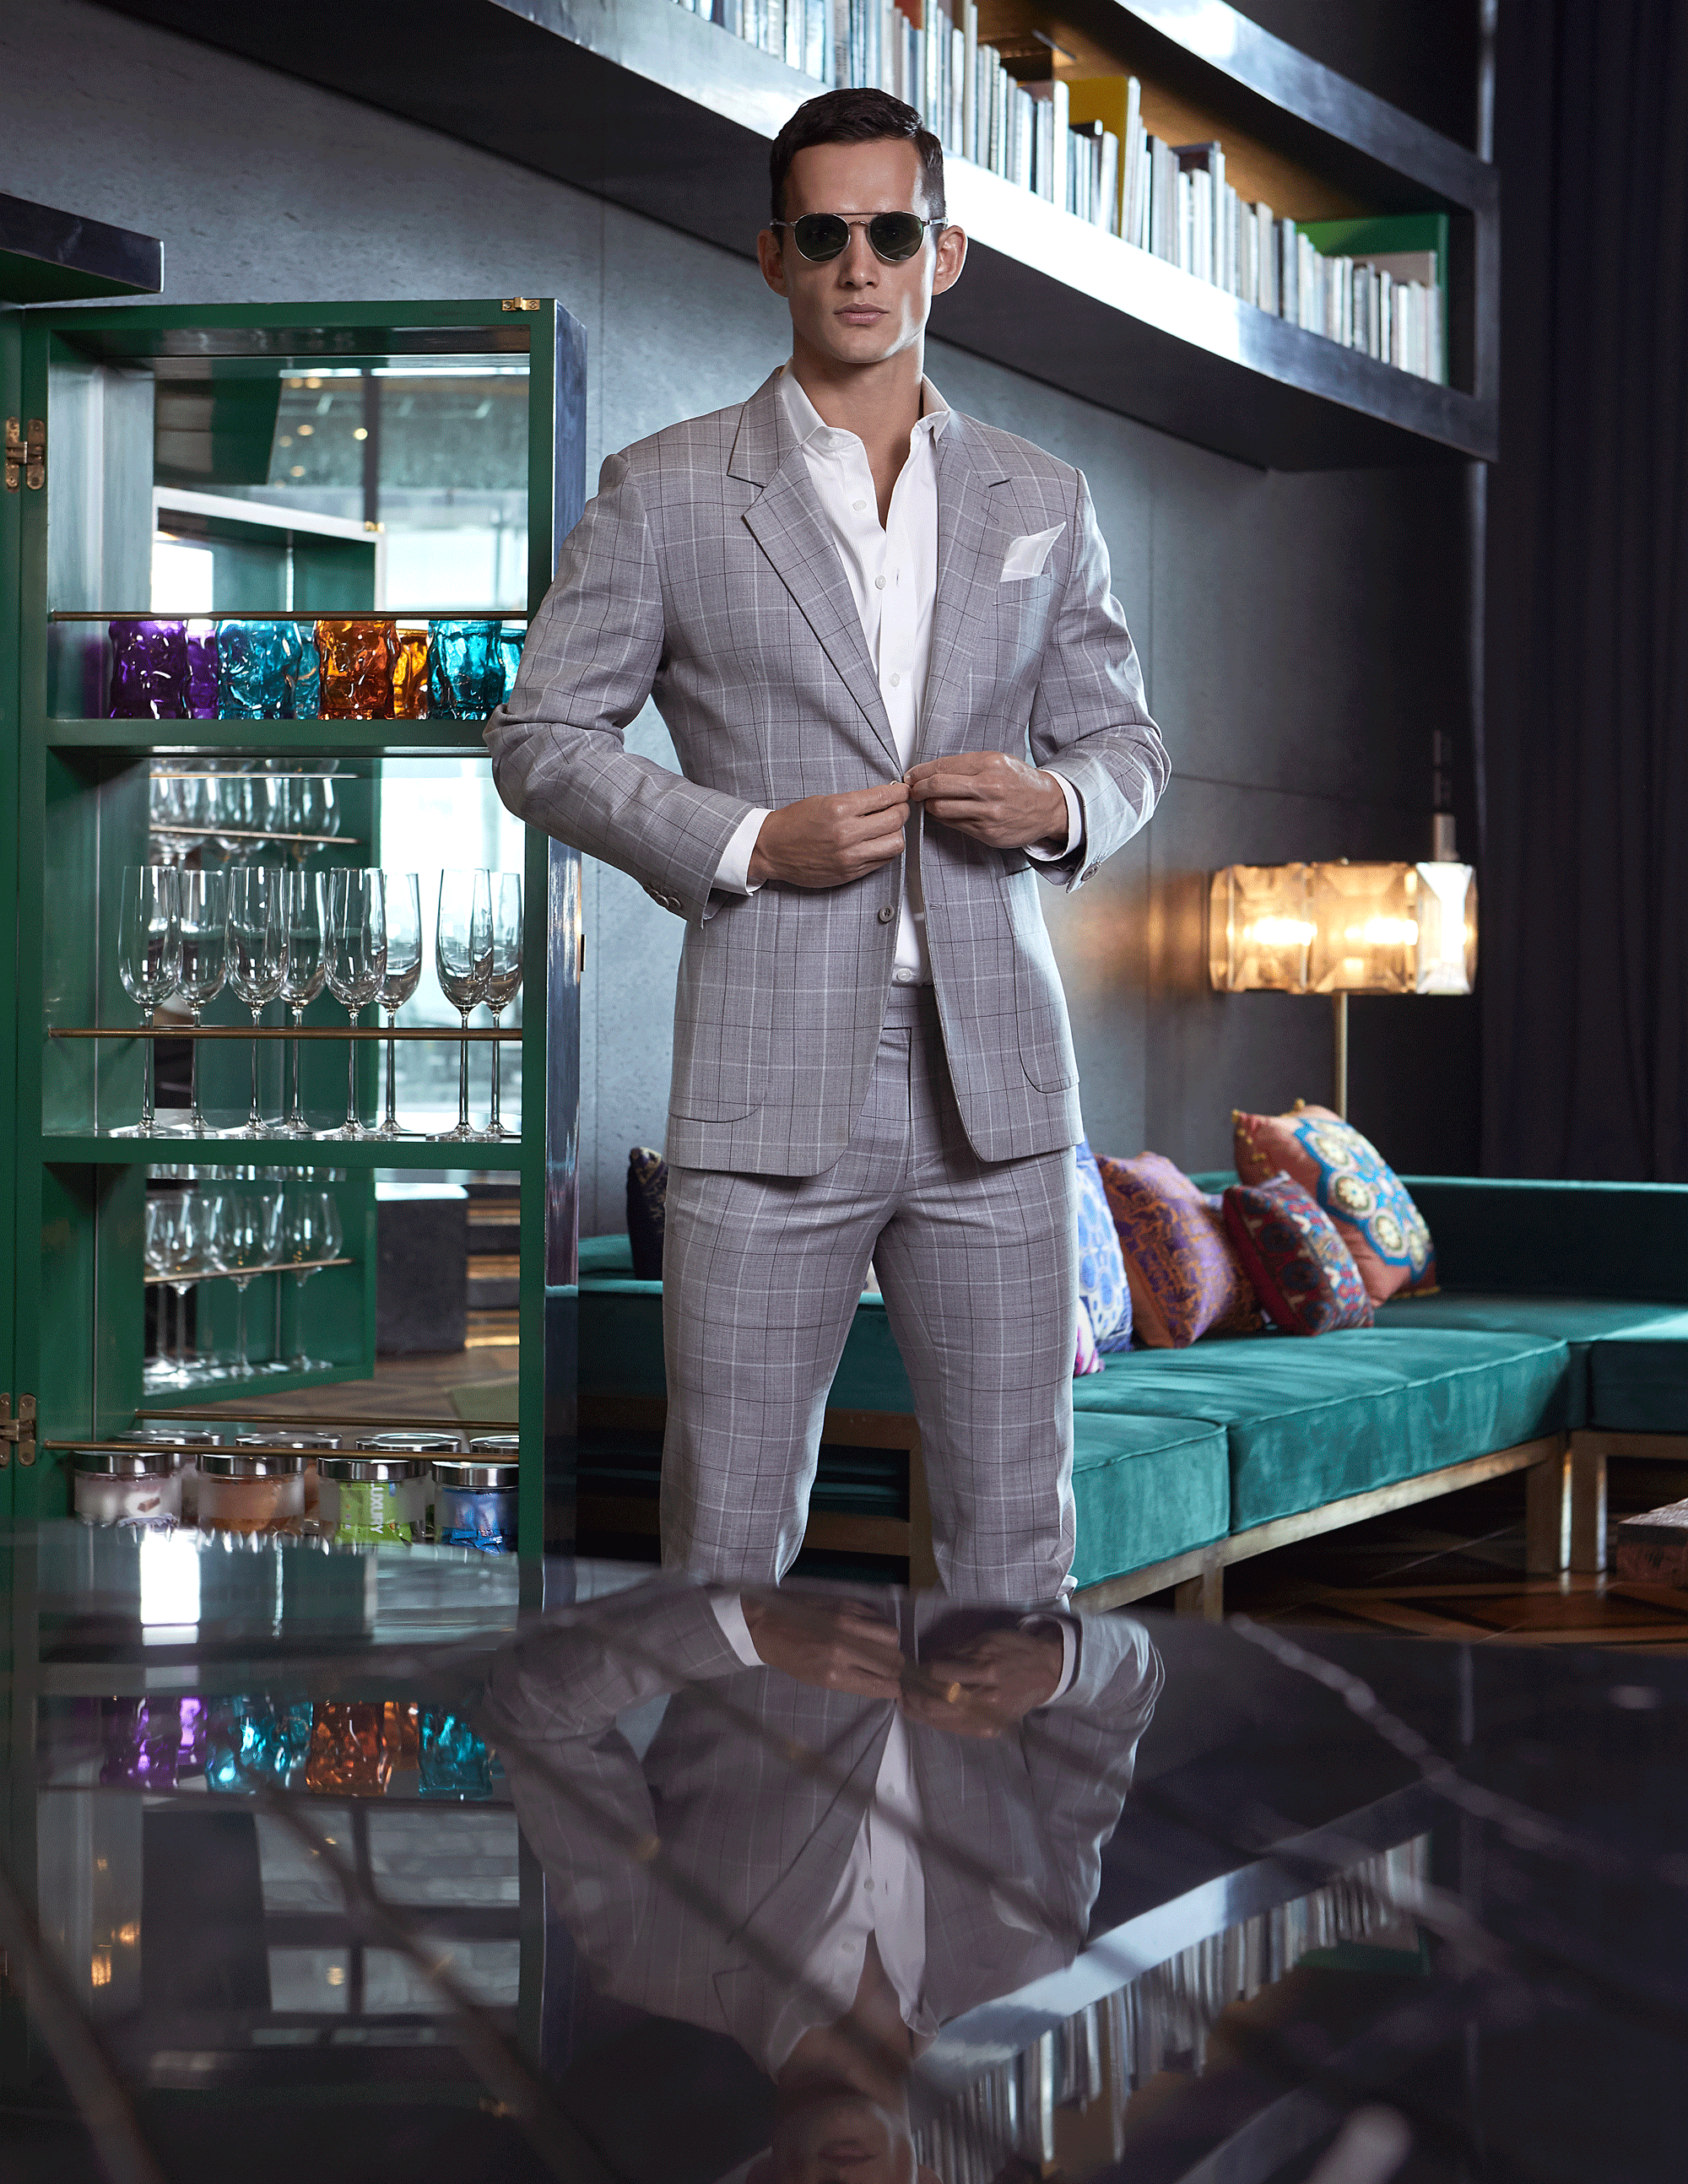 Mika - clothes : POEM Menswear / sunglasses : Boston Club